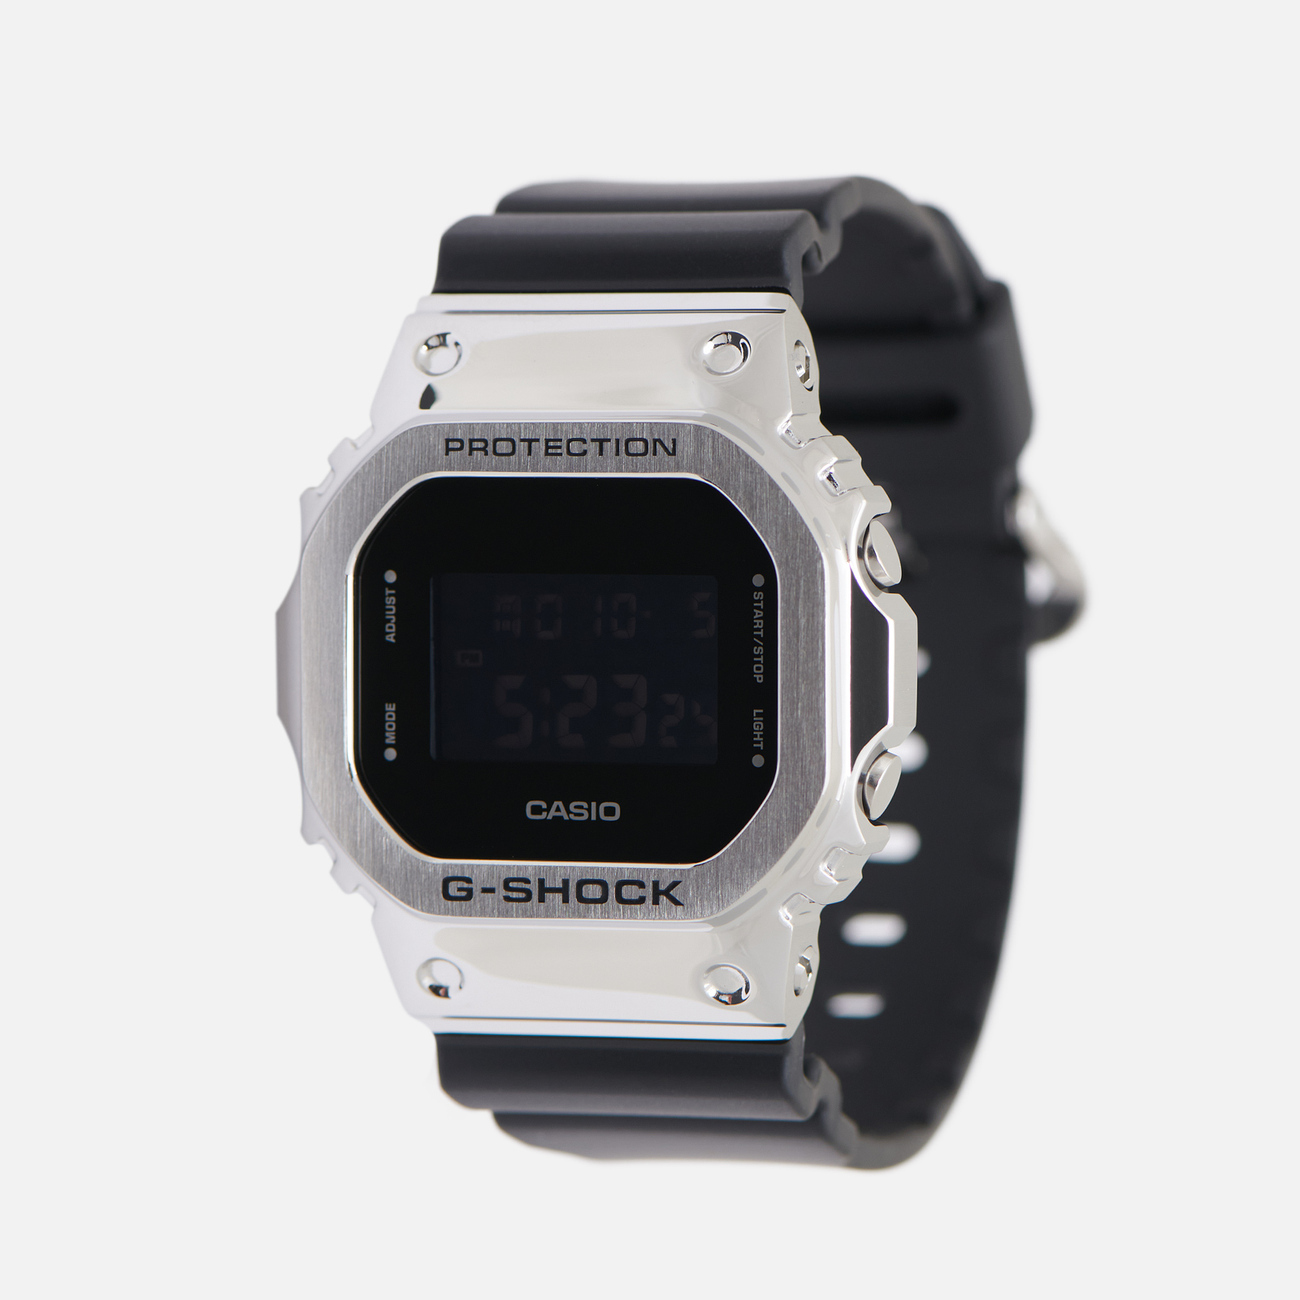 Наручные часы CASIO G-SHOCK GM-5600-1ER Silver/Black